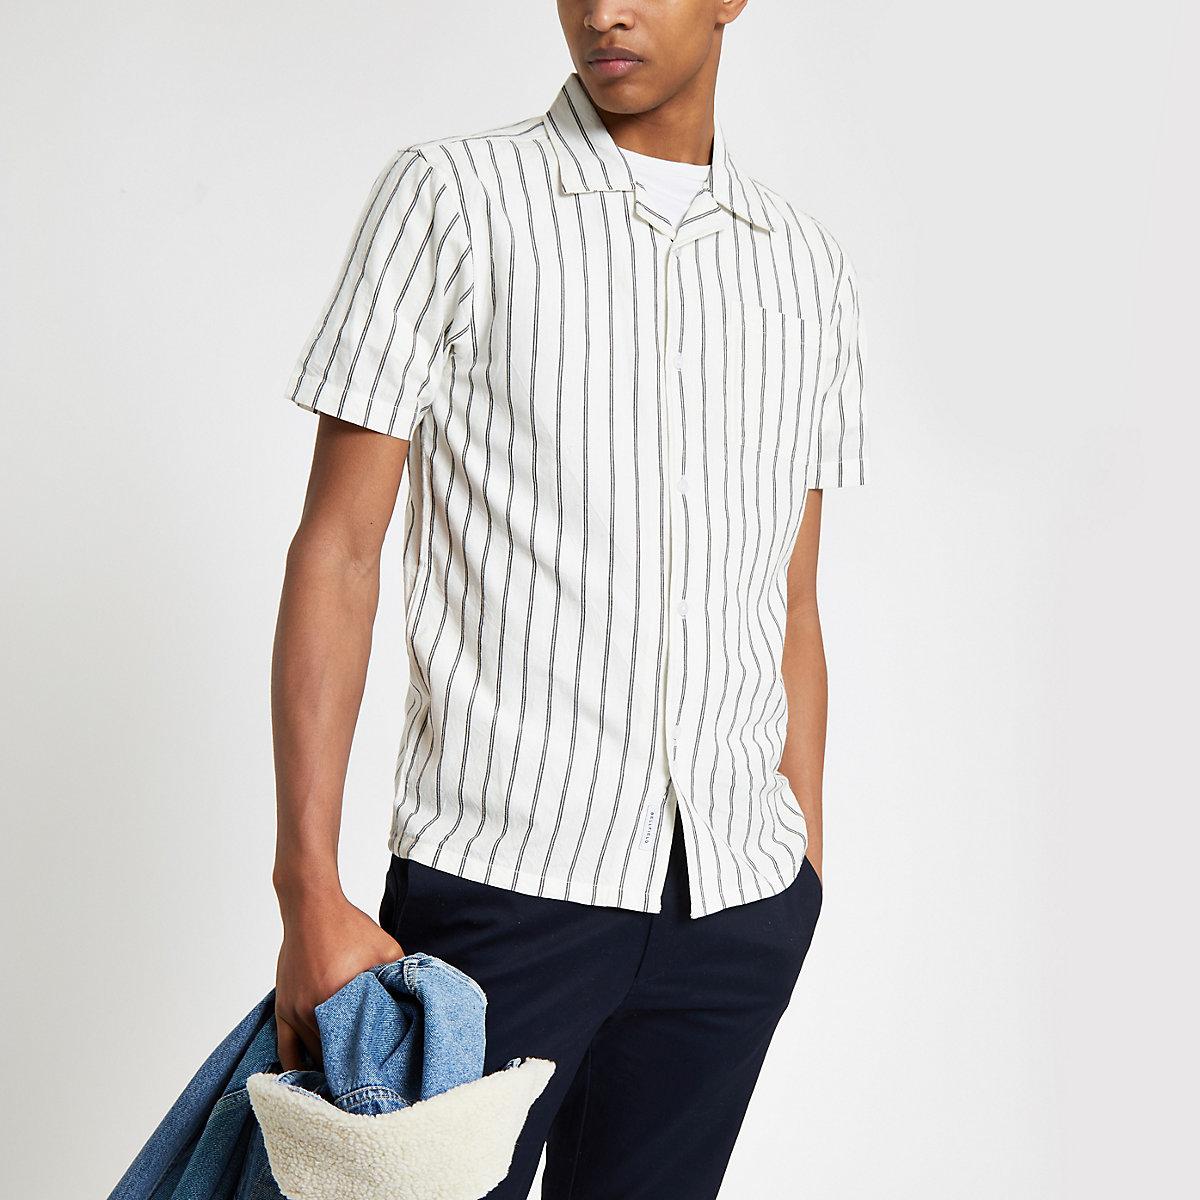 Bellfield white vertical stripe shirt